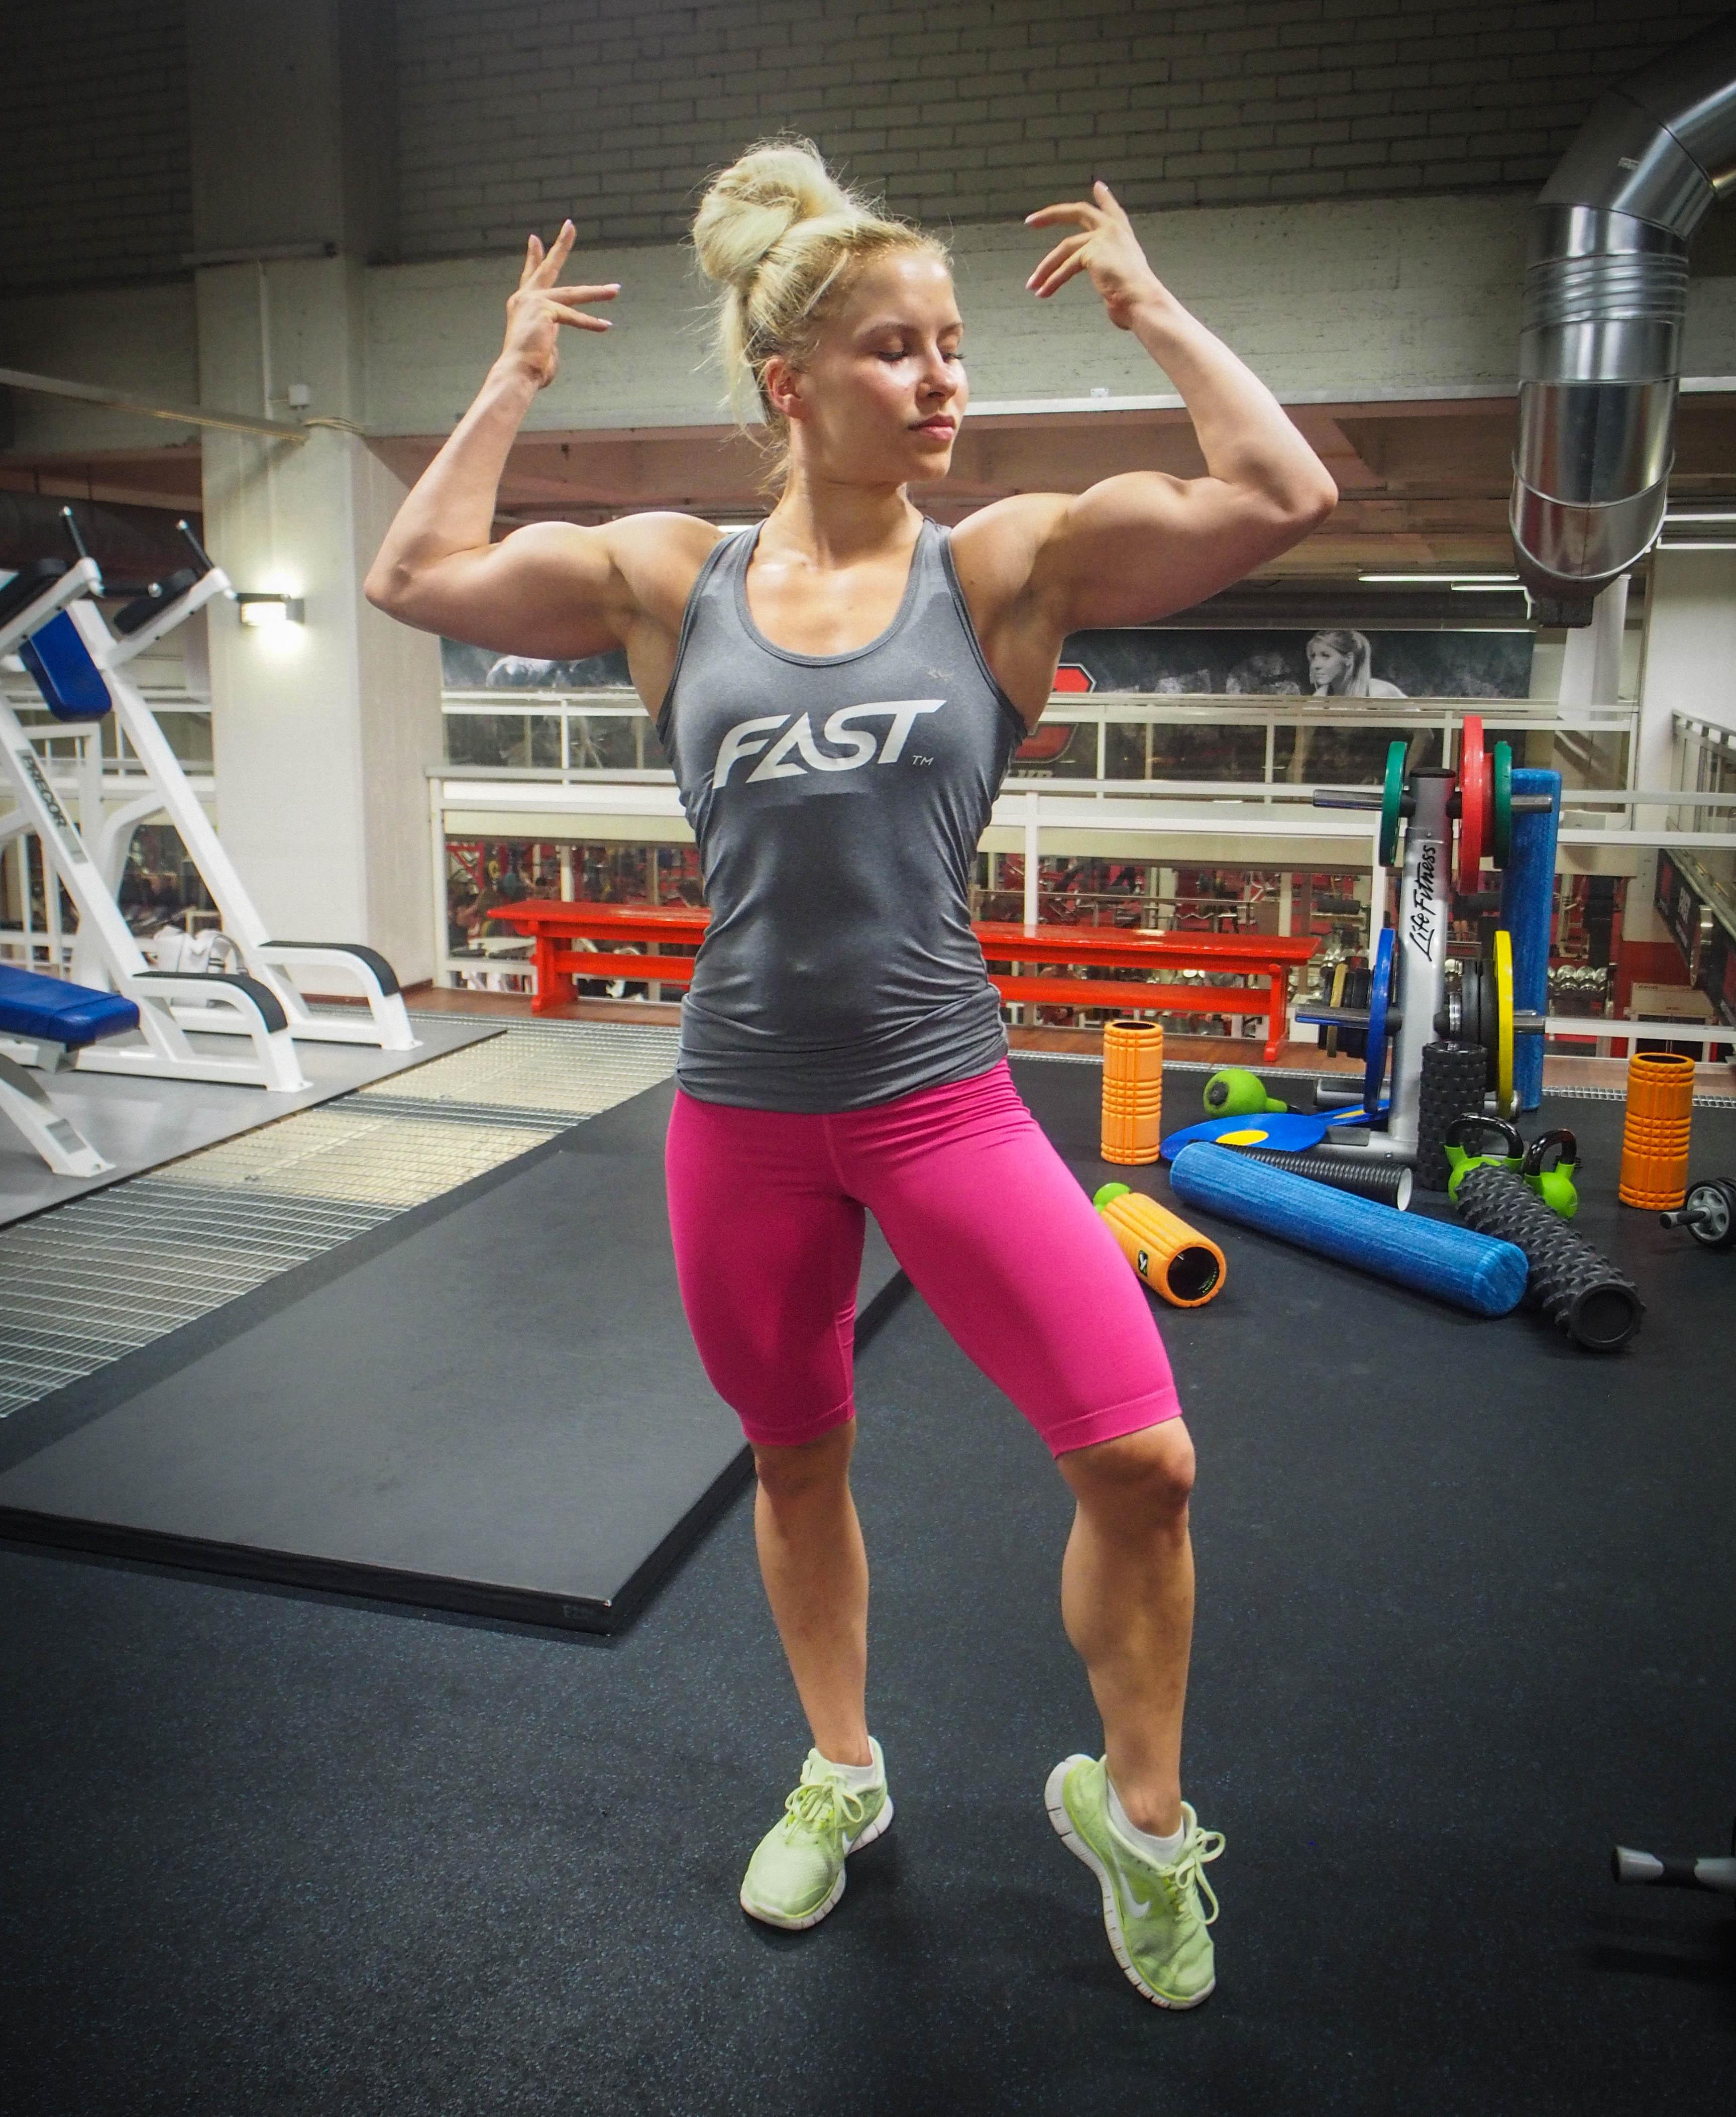 piia-pajunen-fitness-2